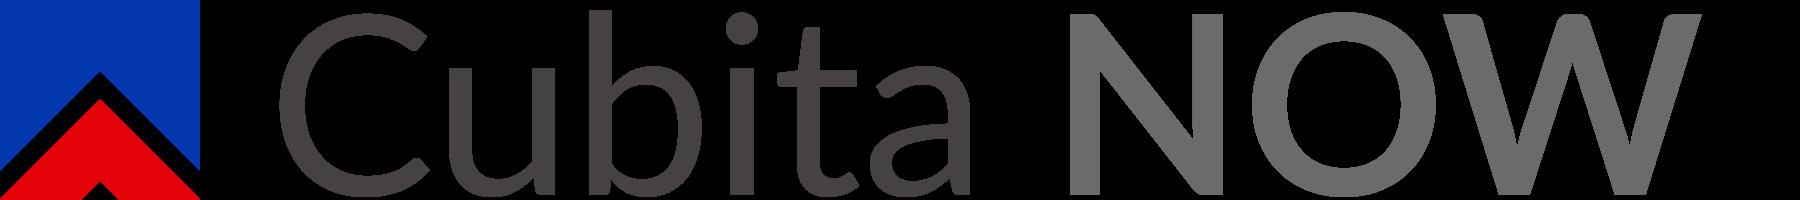 CubitaNOW Logo